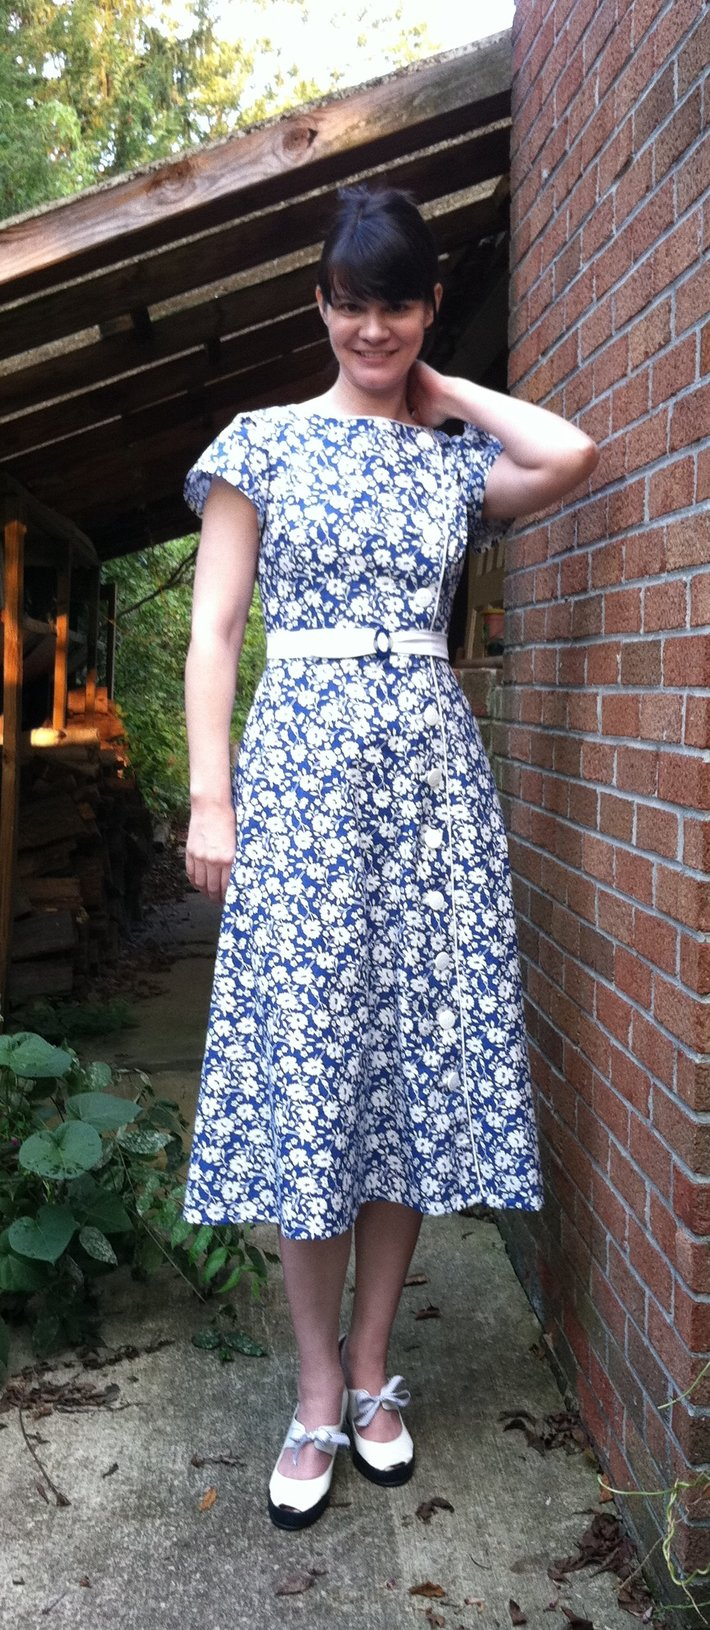 mock mid-'30s dress